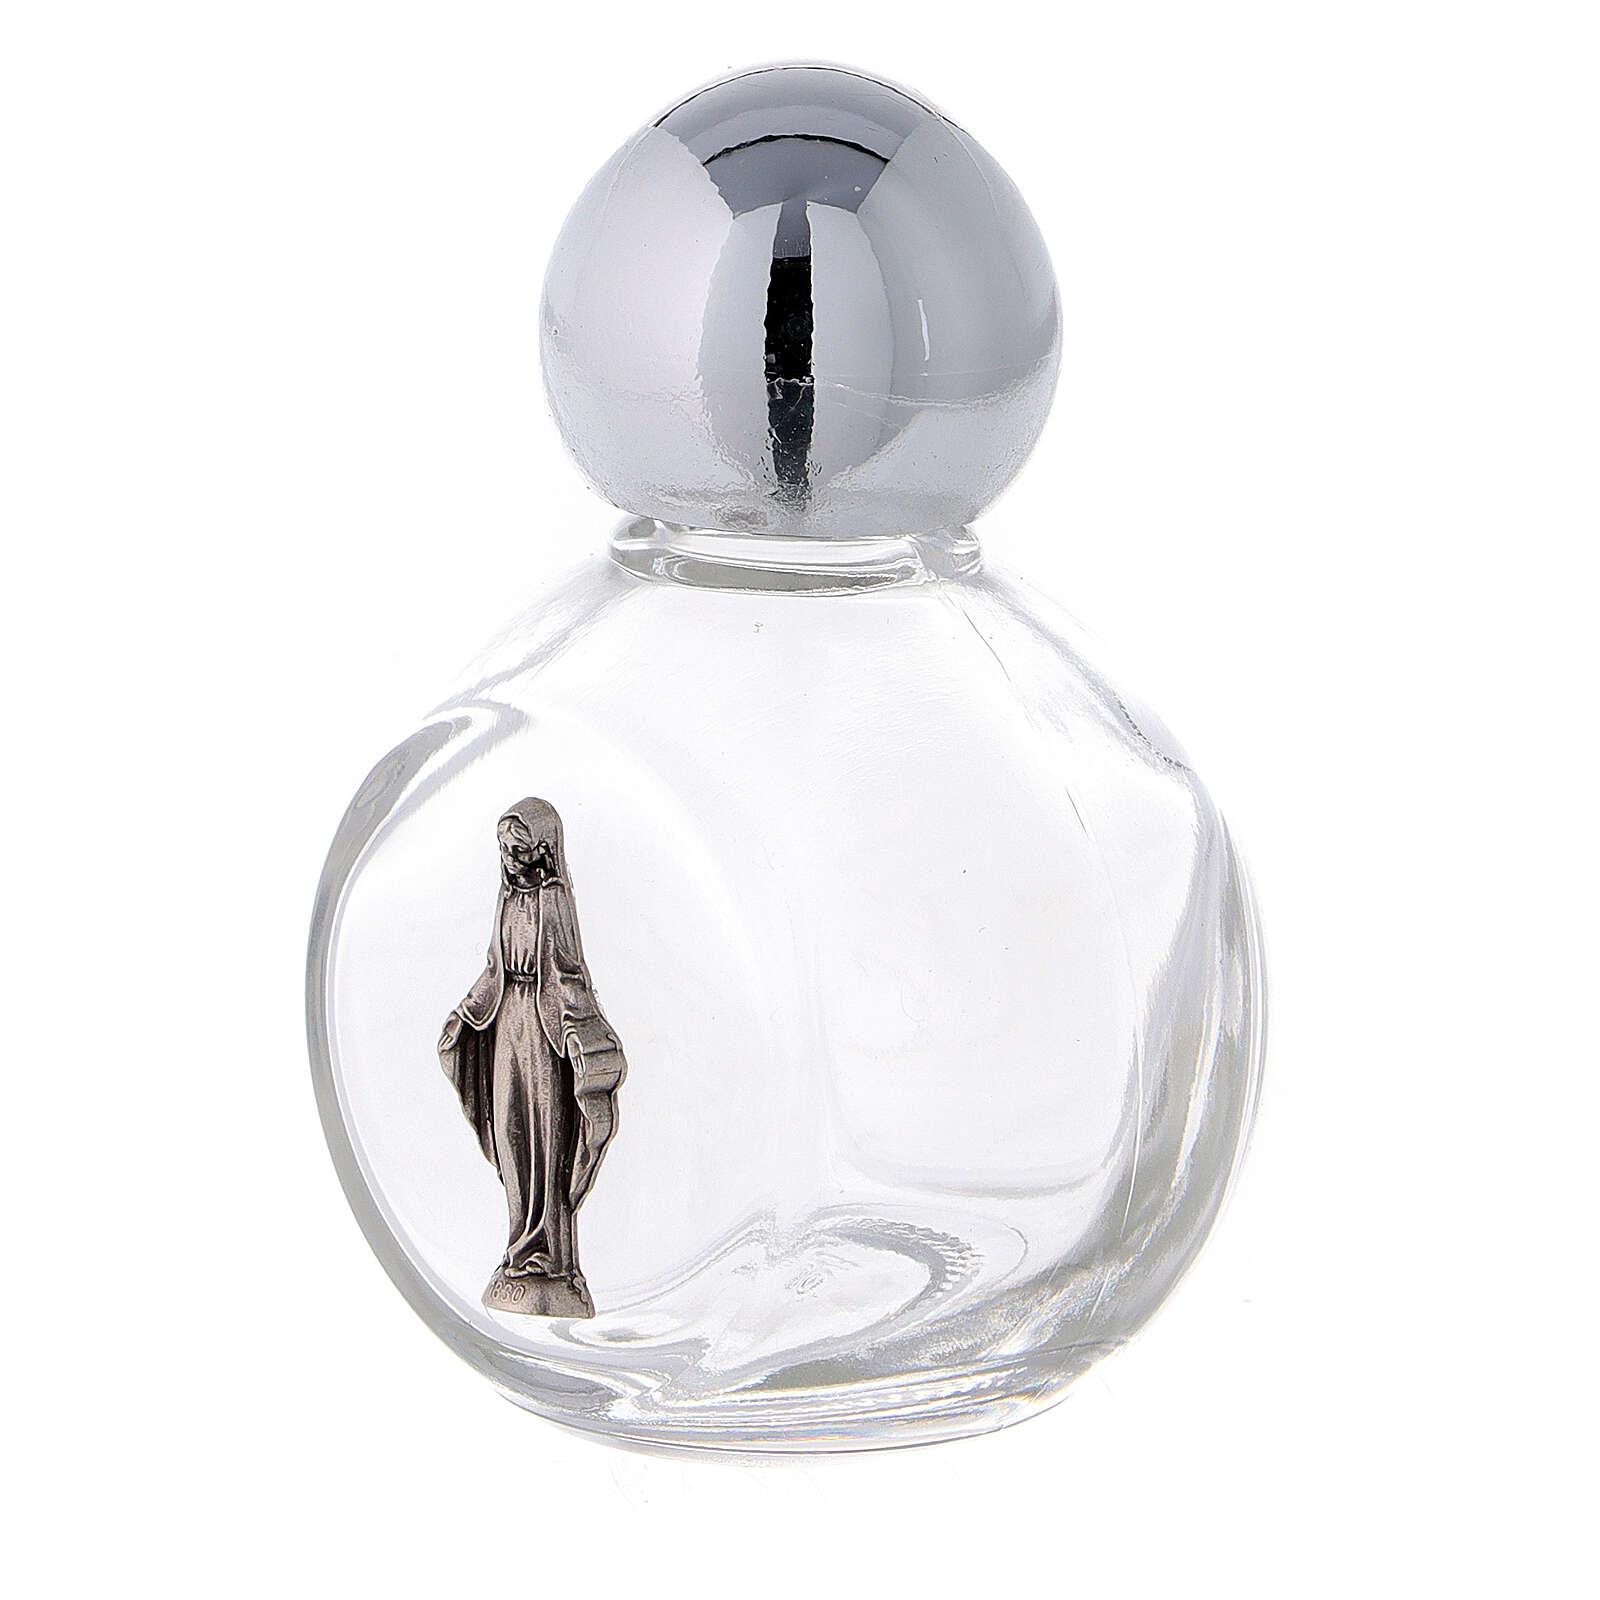 Bottiglietta acqua Benedetta 35 ml dell'Immacolata (50 PZ.) vetro 3